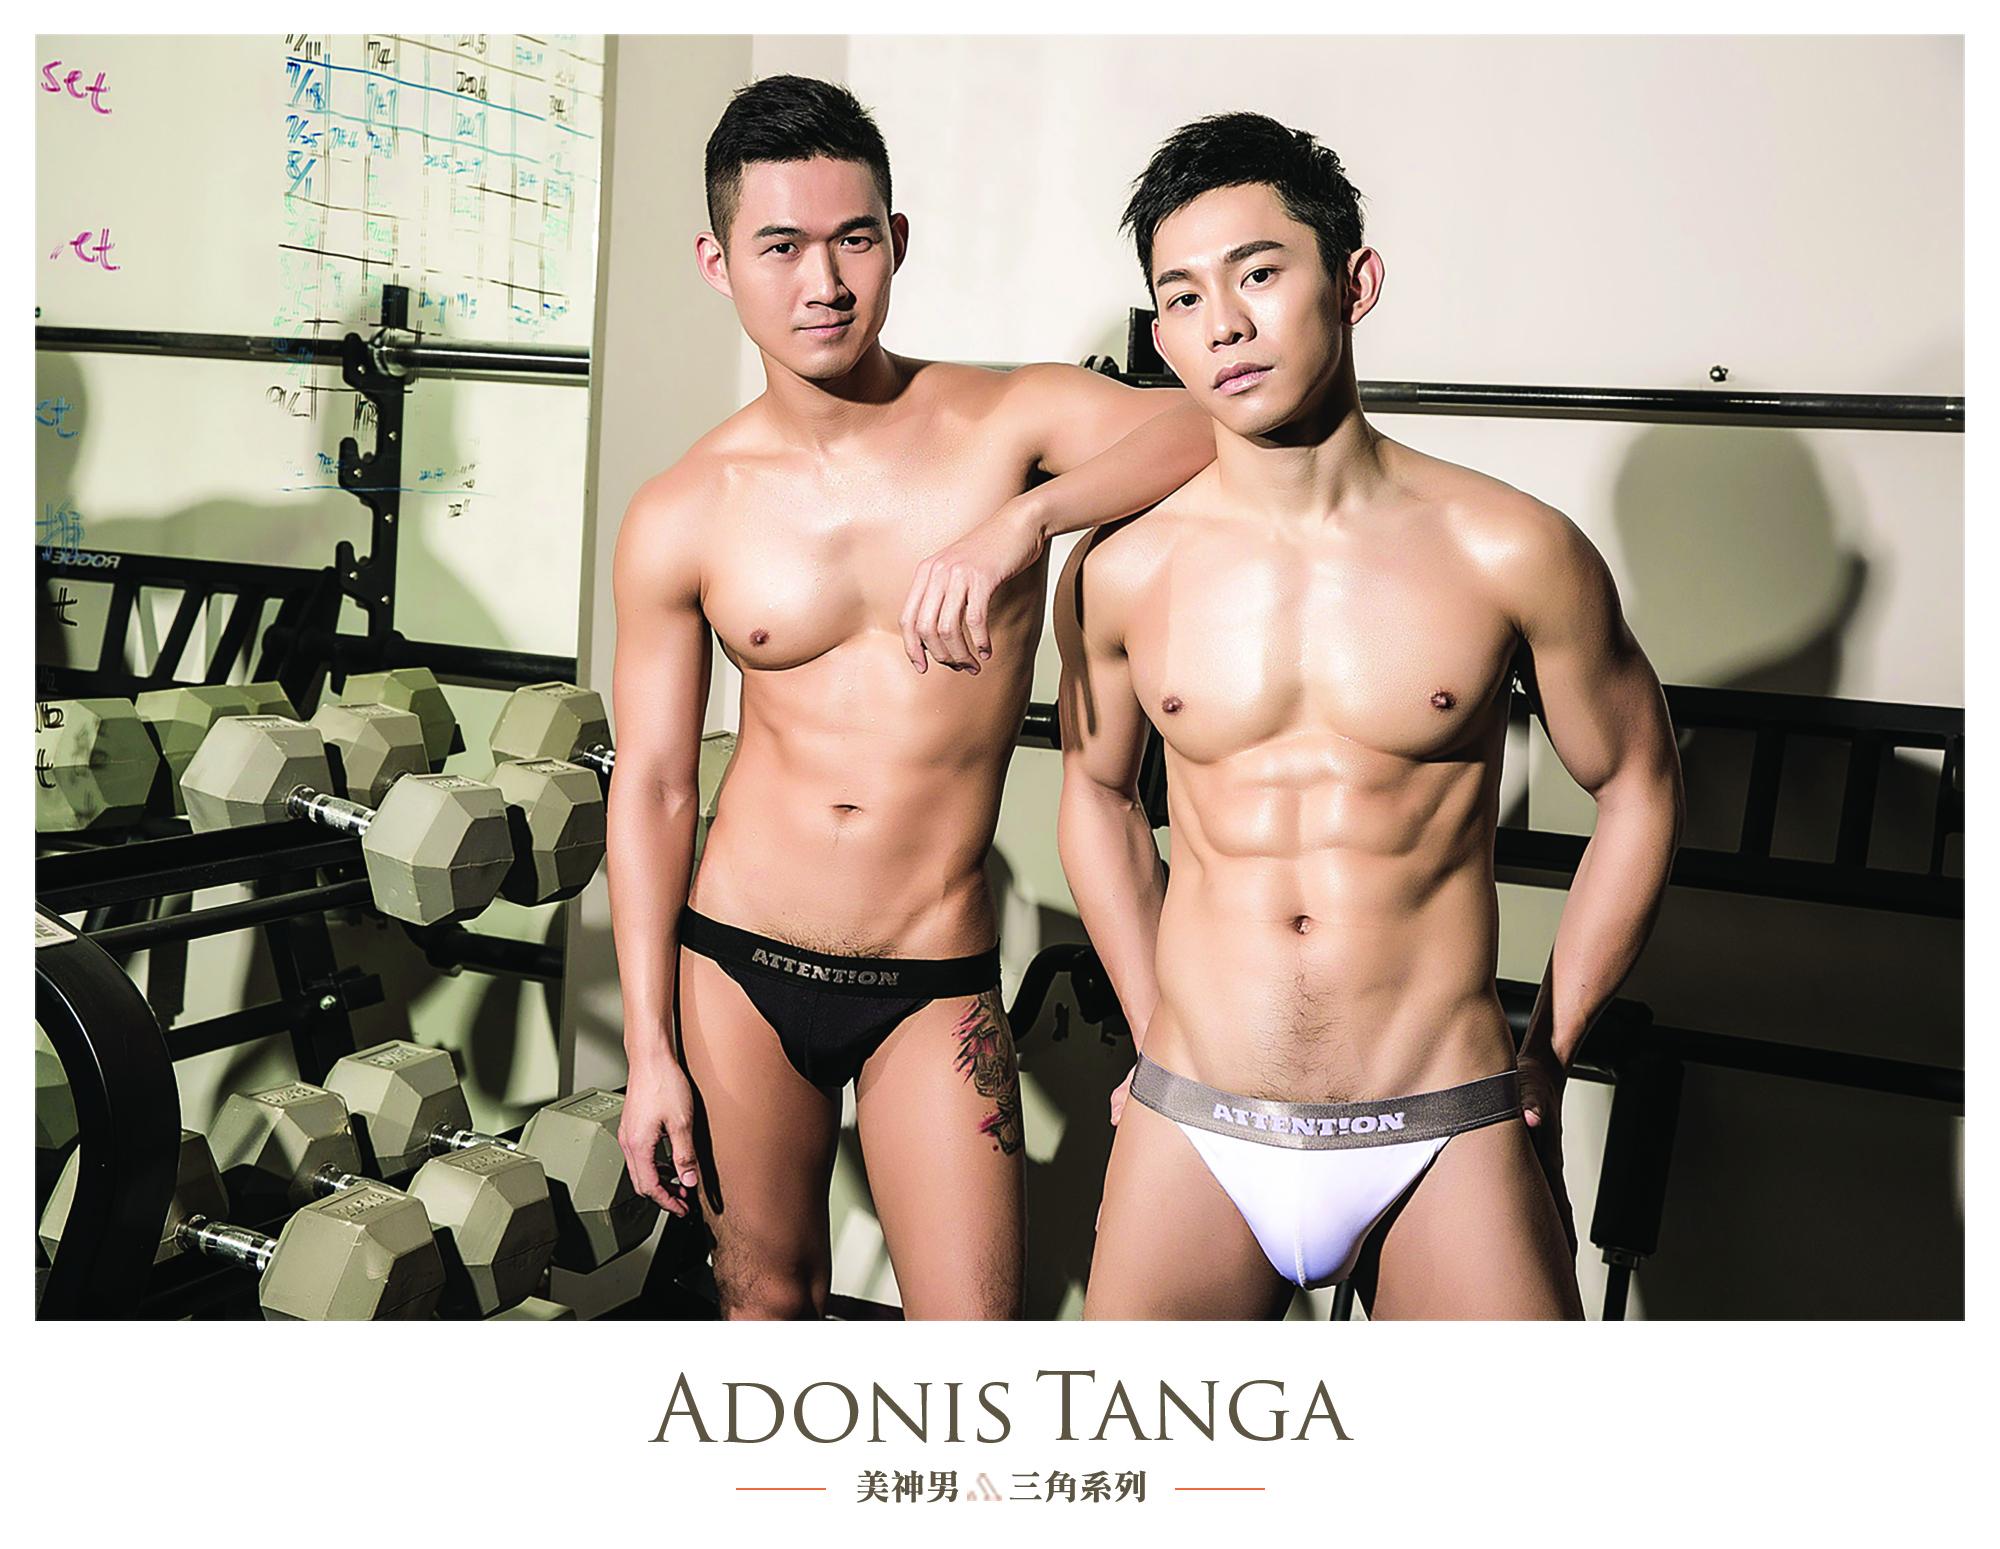 Attention Wear, Adonis tanga briefs, Tanga Briefs, 高開衩三角內褲, 美神男系列, 黑三角, 白三角, Black, White